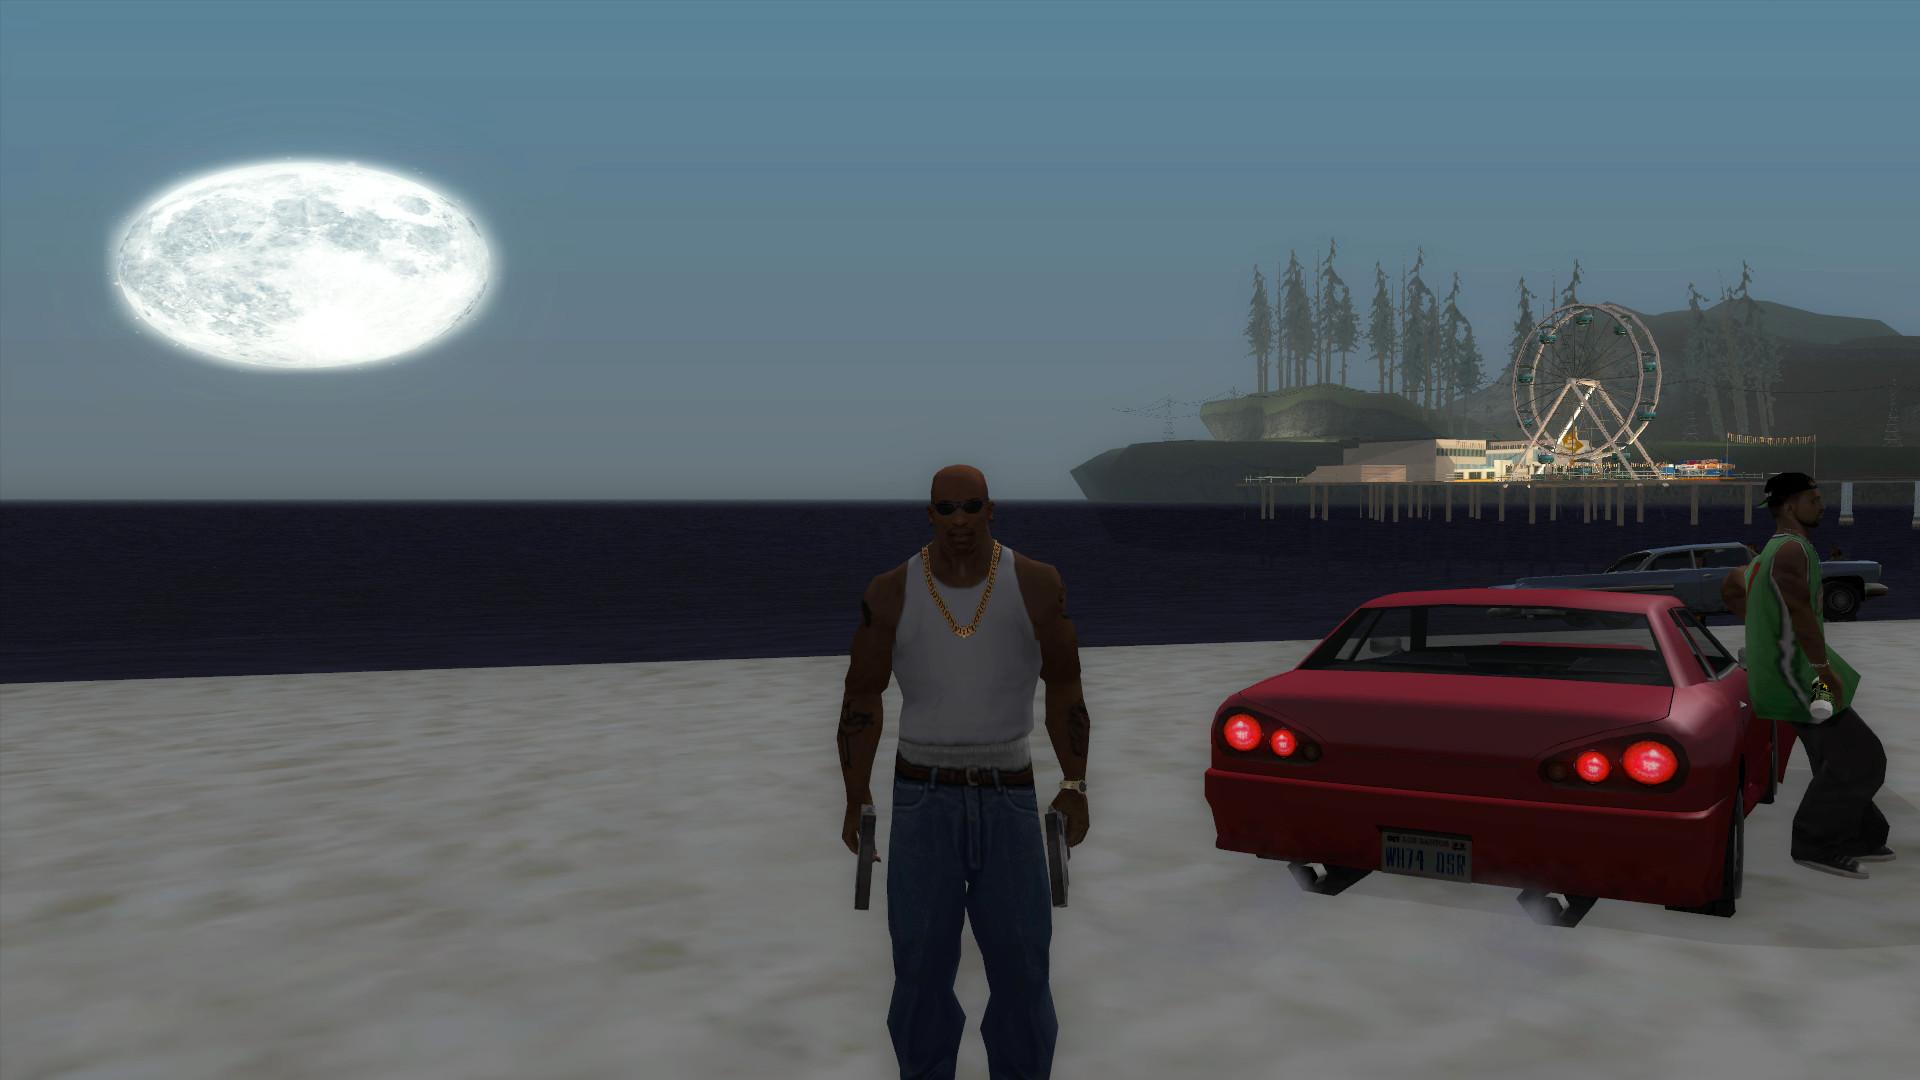 gta_sa 2016-05-10 11-44-33-69.jpg - Grand Theft Auto: San Andreas